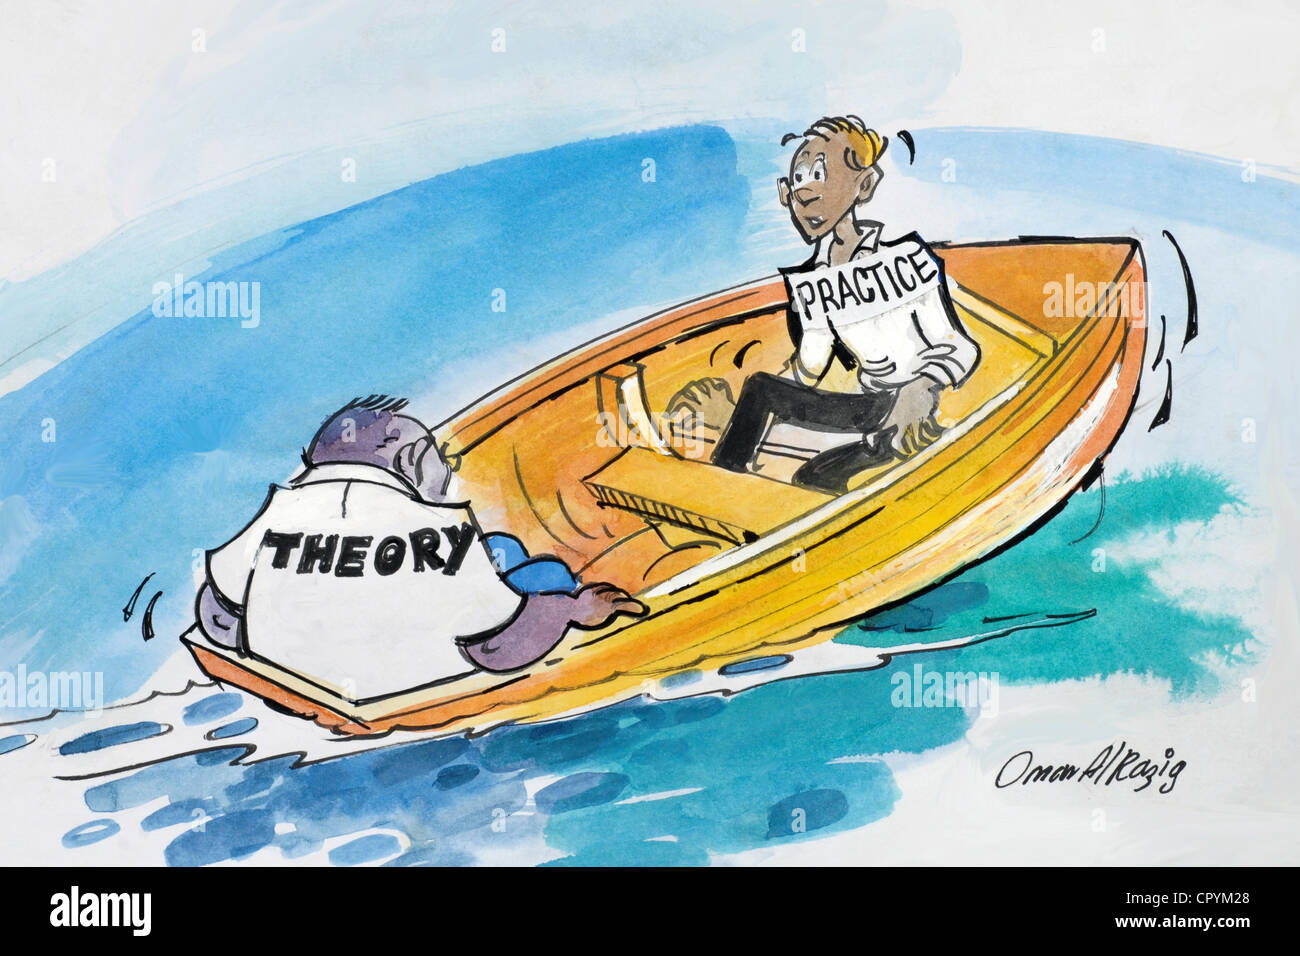 Theory Must Balance Practice - Stock Image